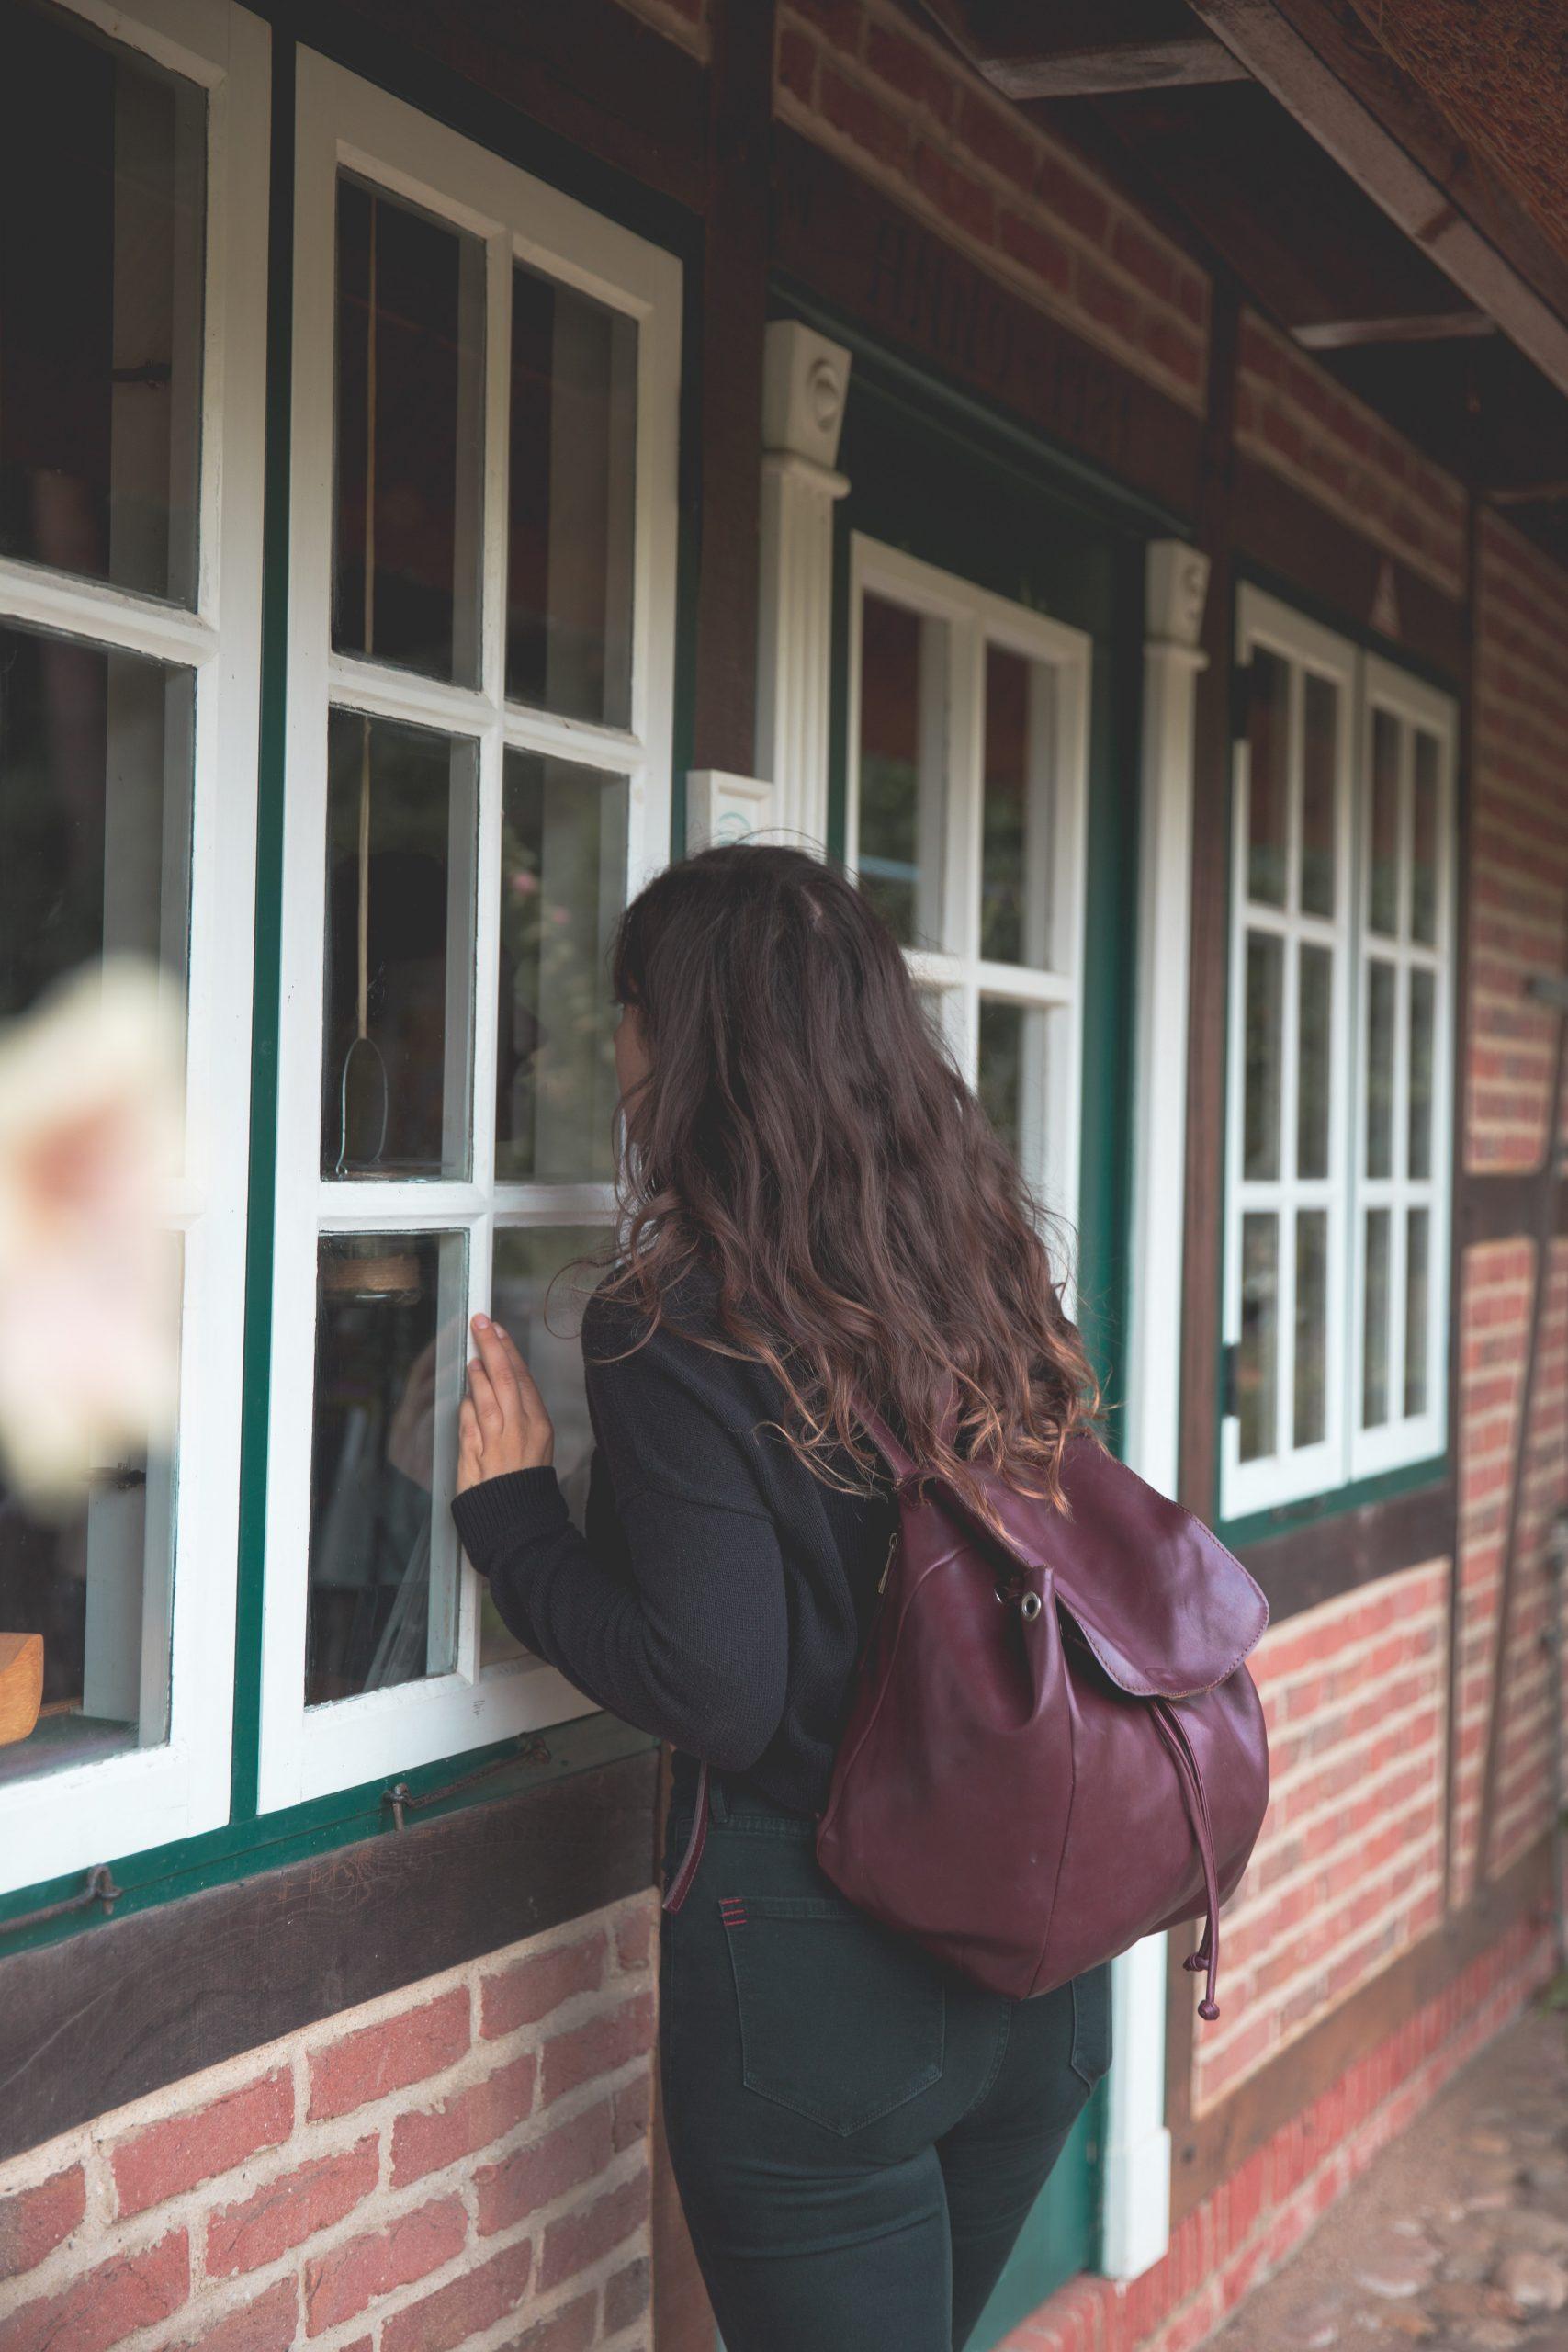 Kelsey Looking Through a Window of a brick building in the Loki Schmidt Botanical Gardens in Hamburg, Germany